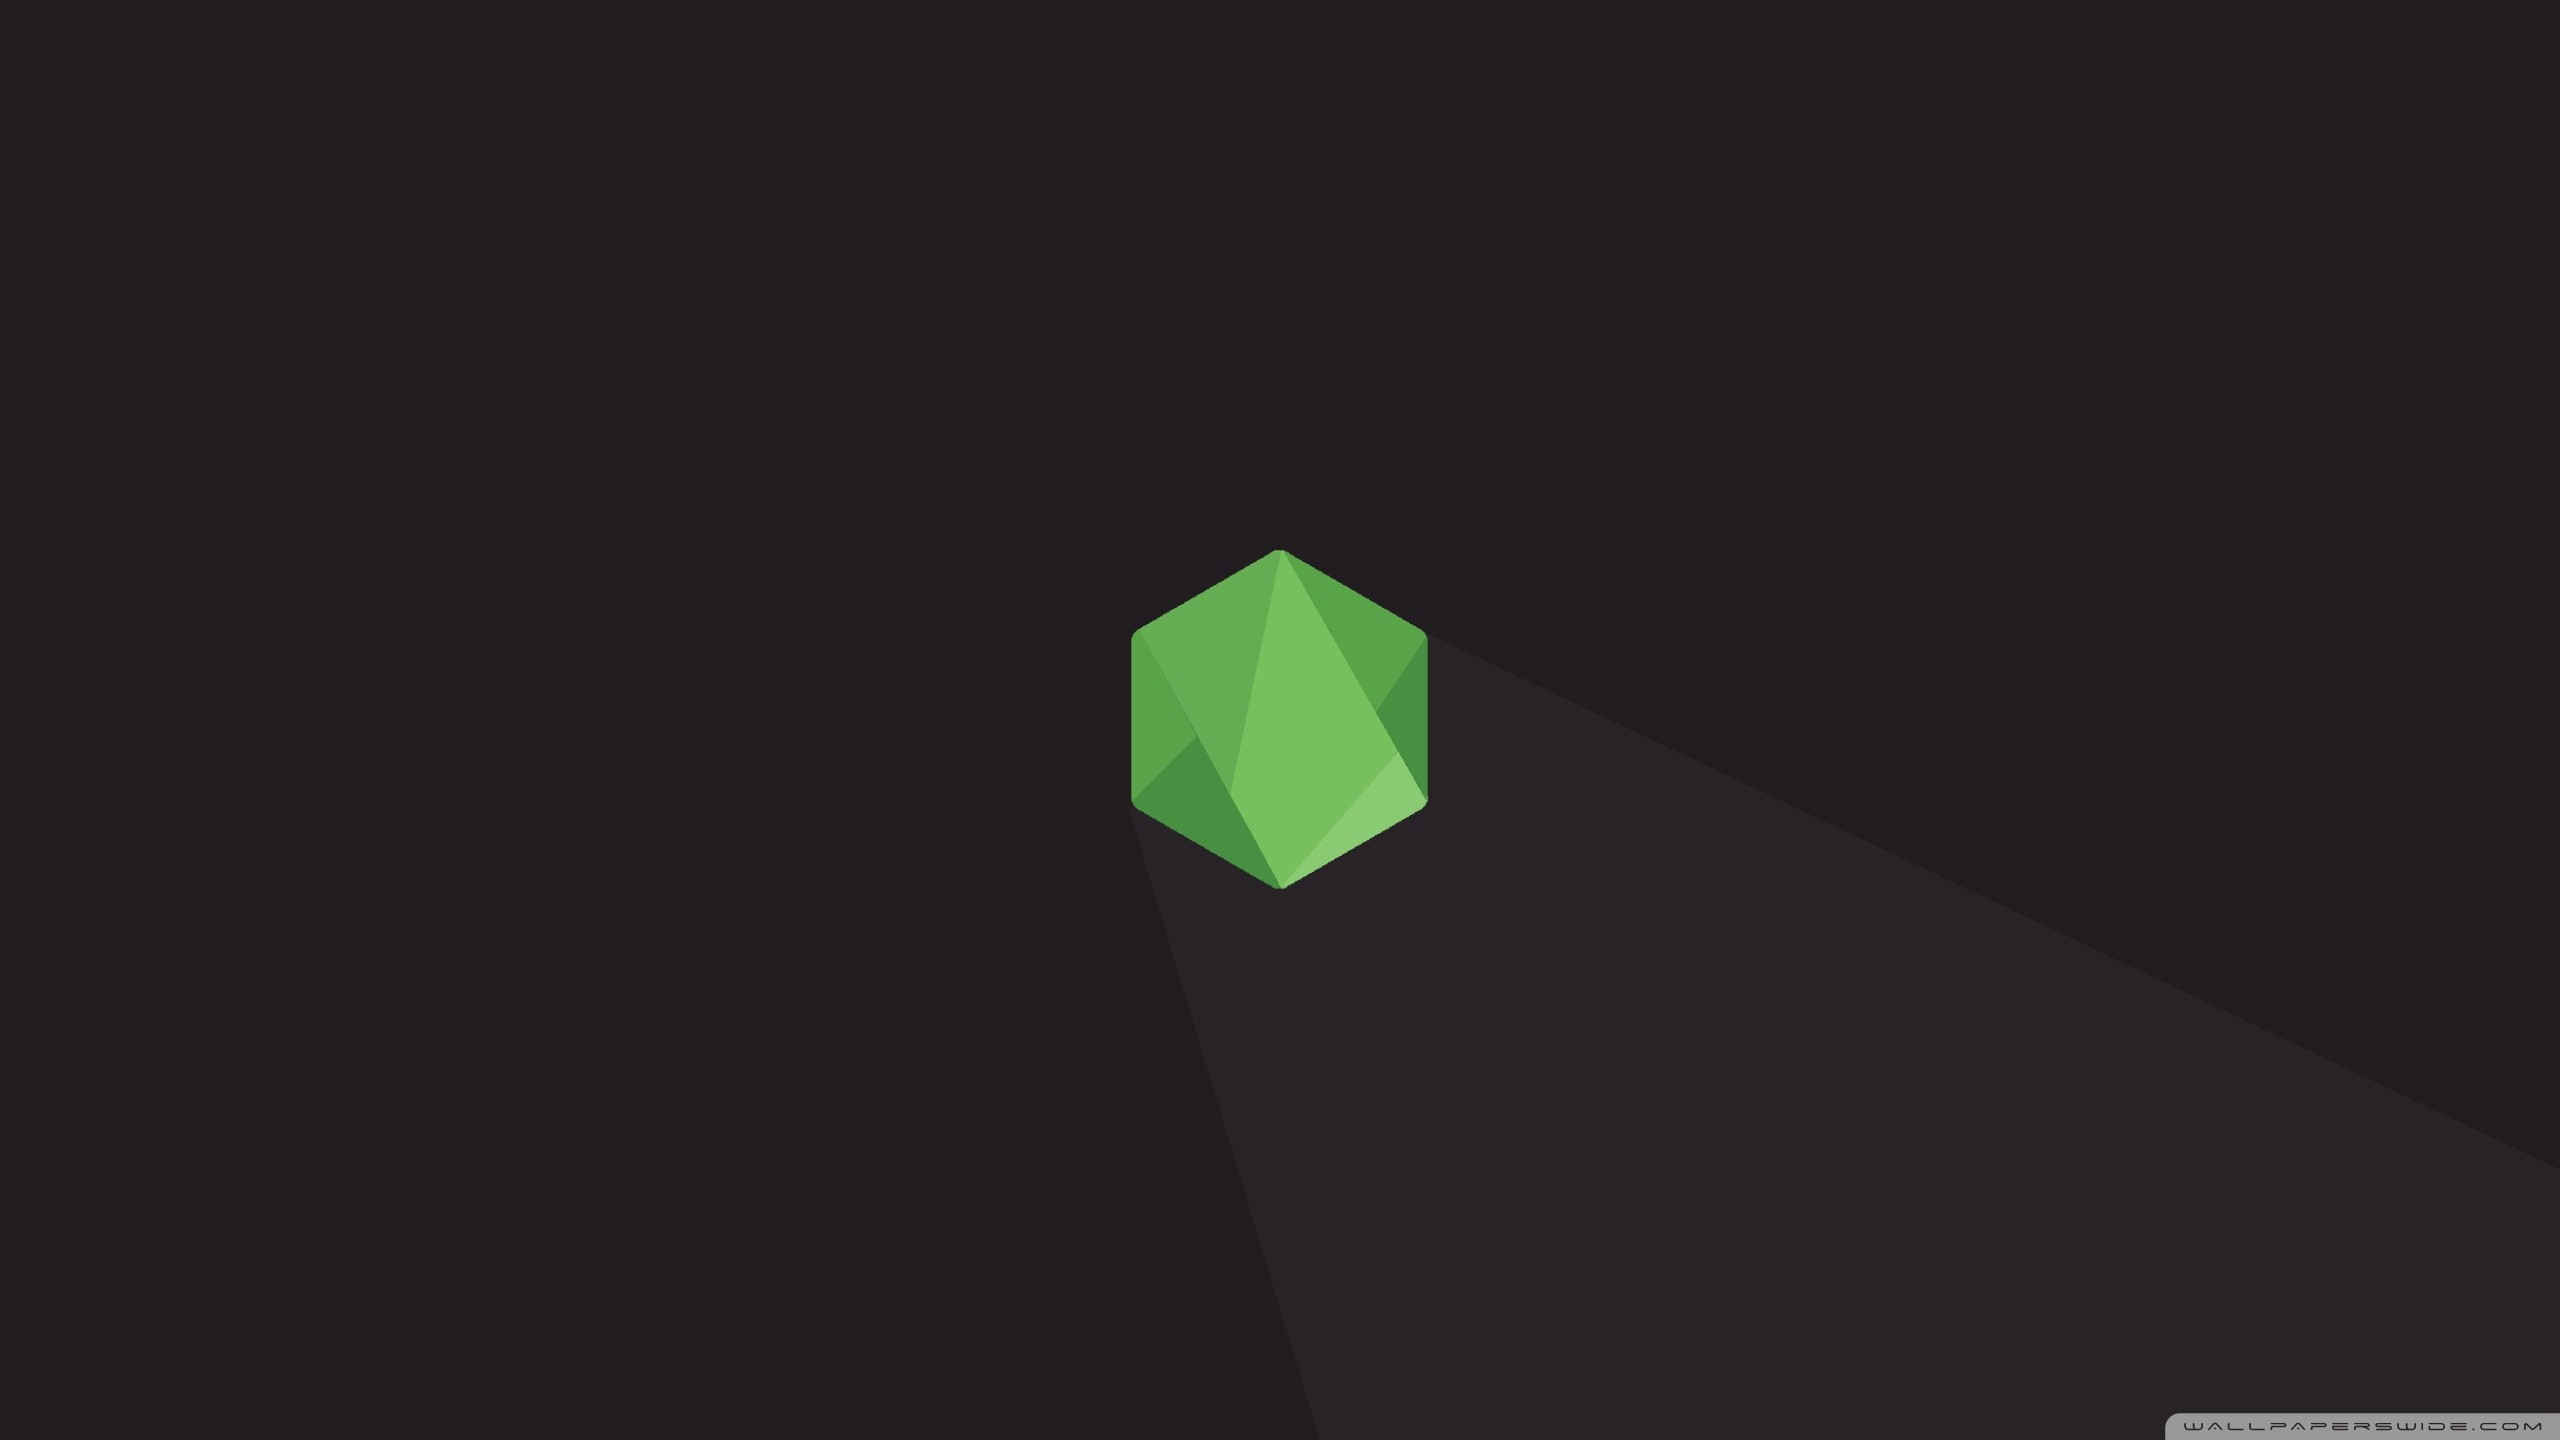 Res: 2560x1440, reactJS, Facebook, JavaScript, Minimalism, Artwork, Simple .